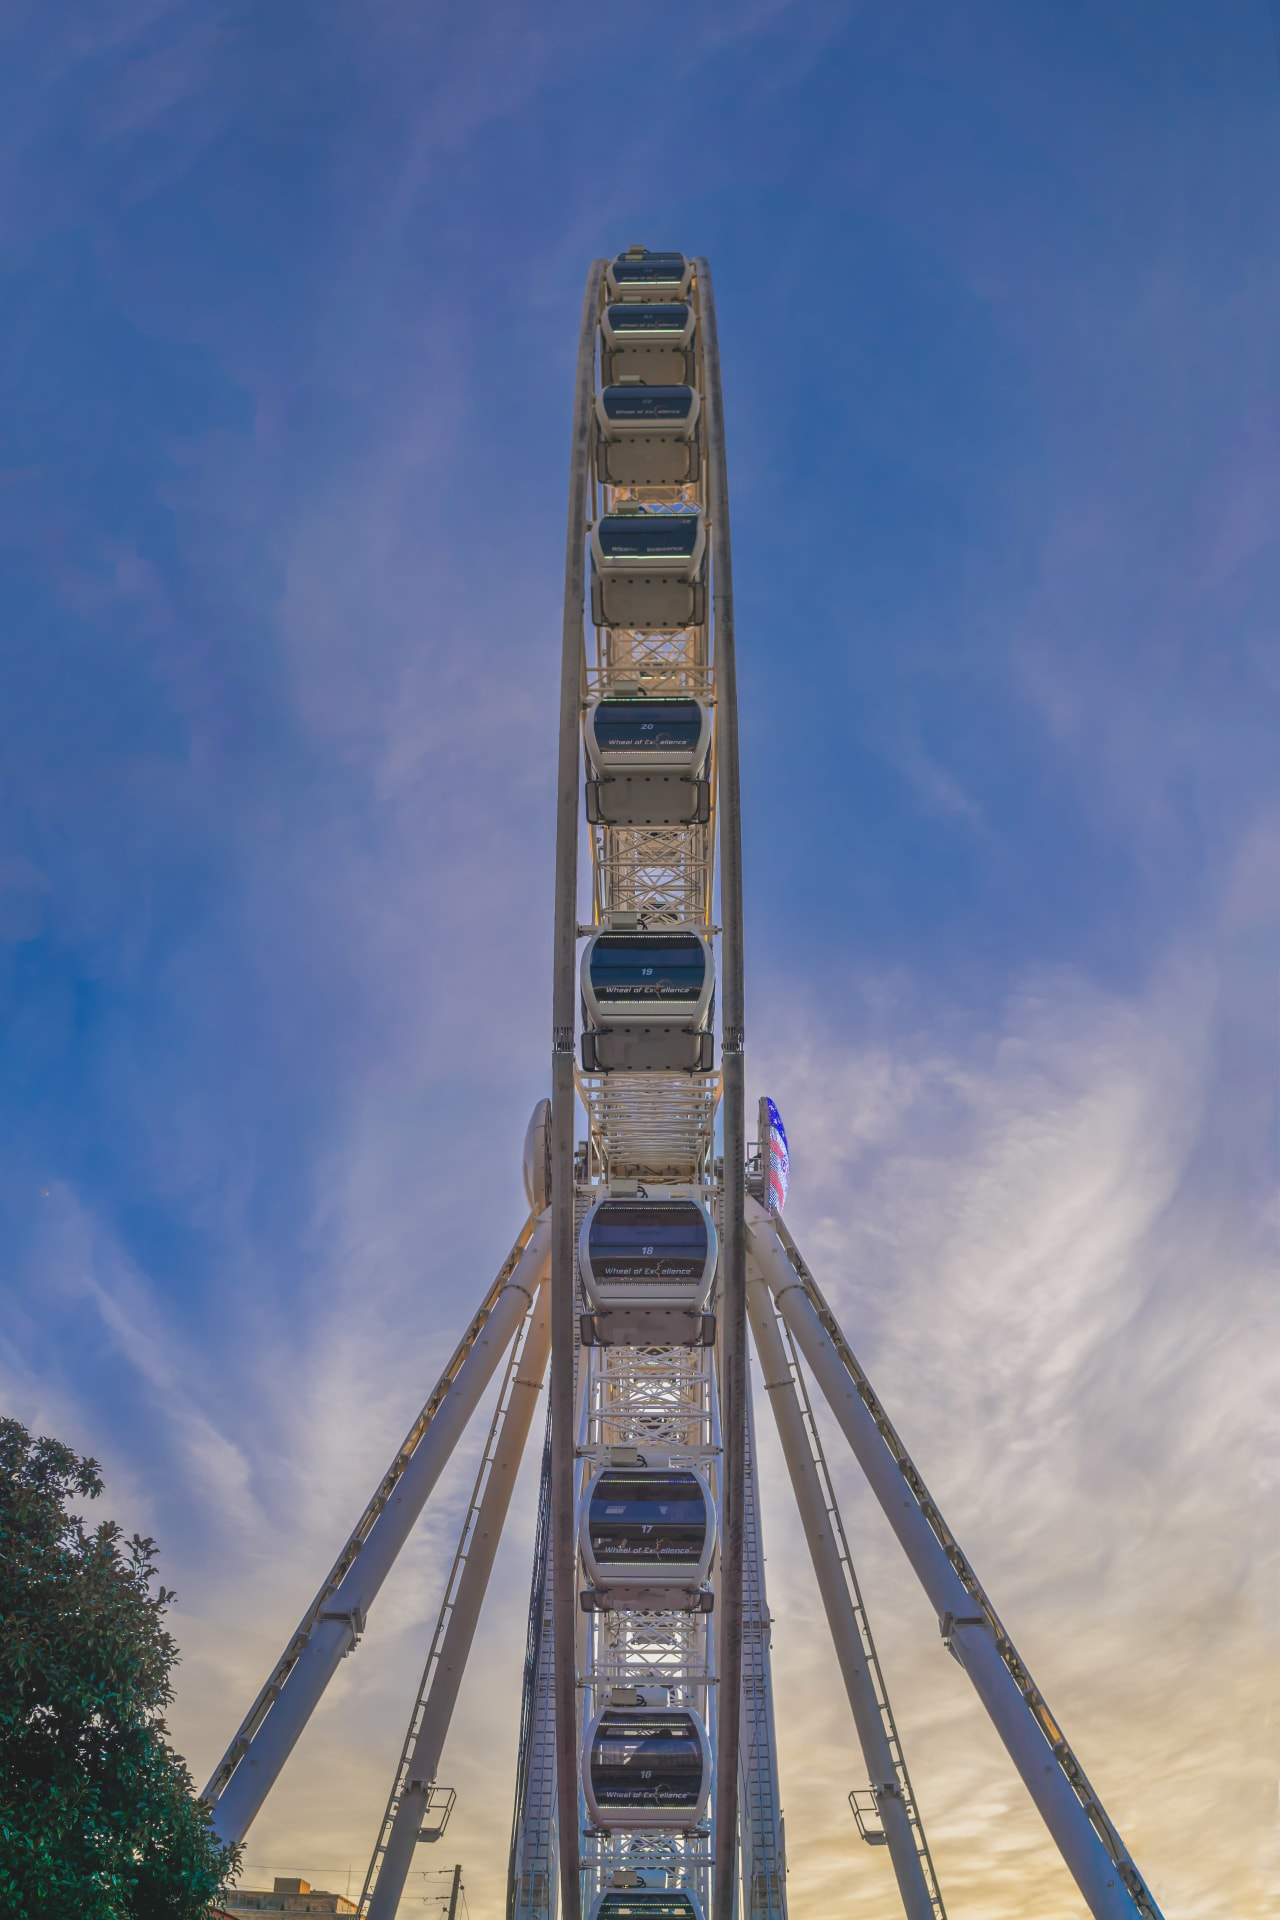 Profile of a Ferris Wheel